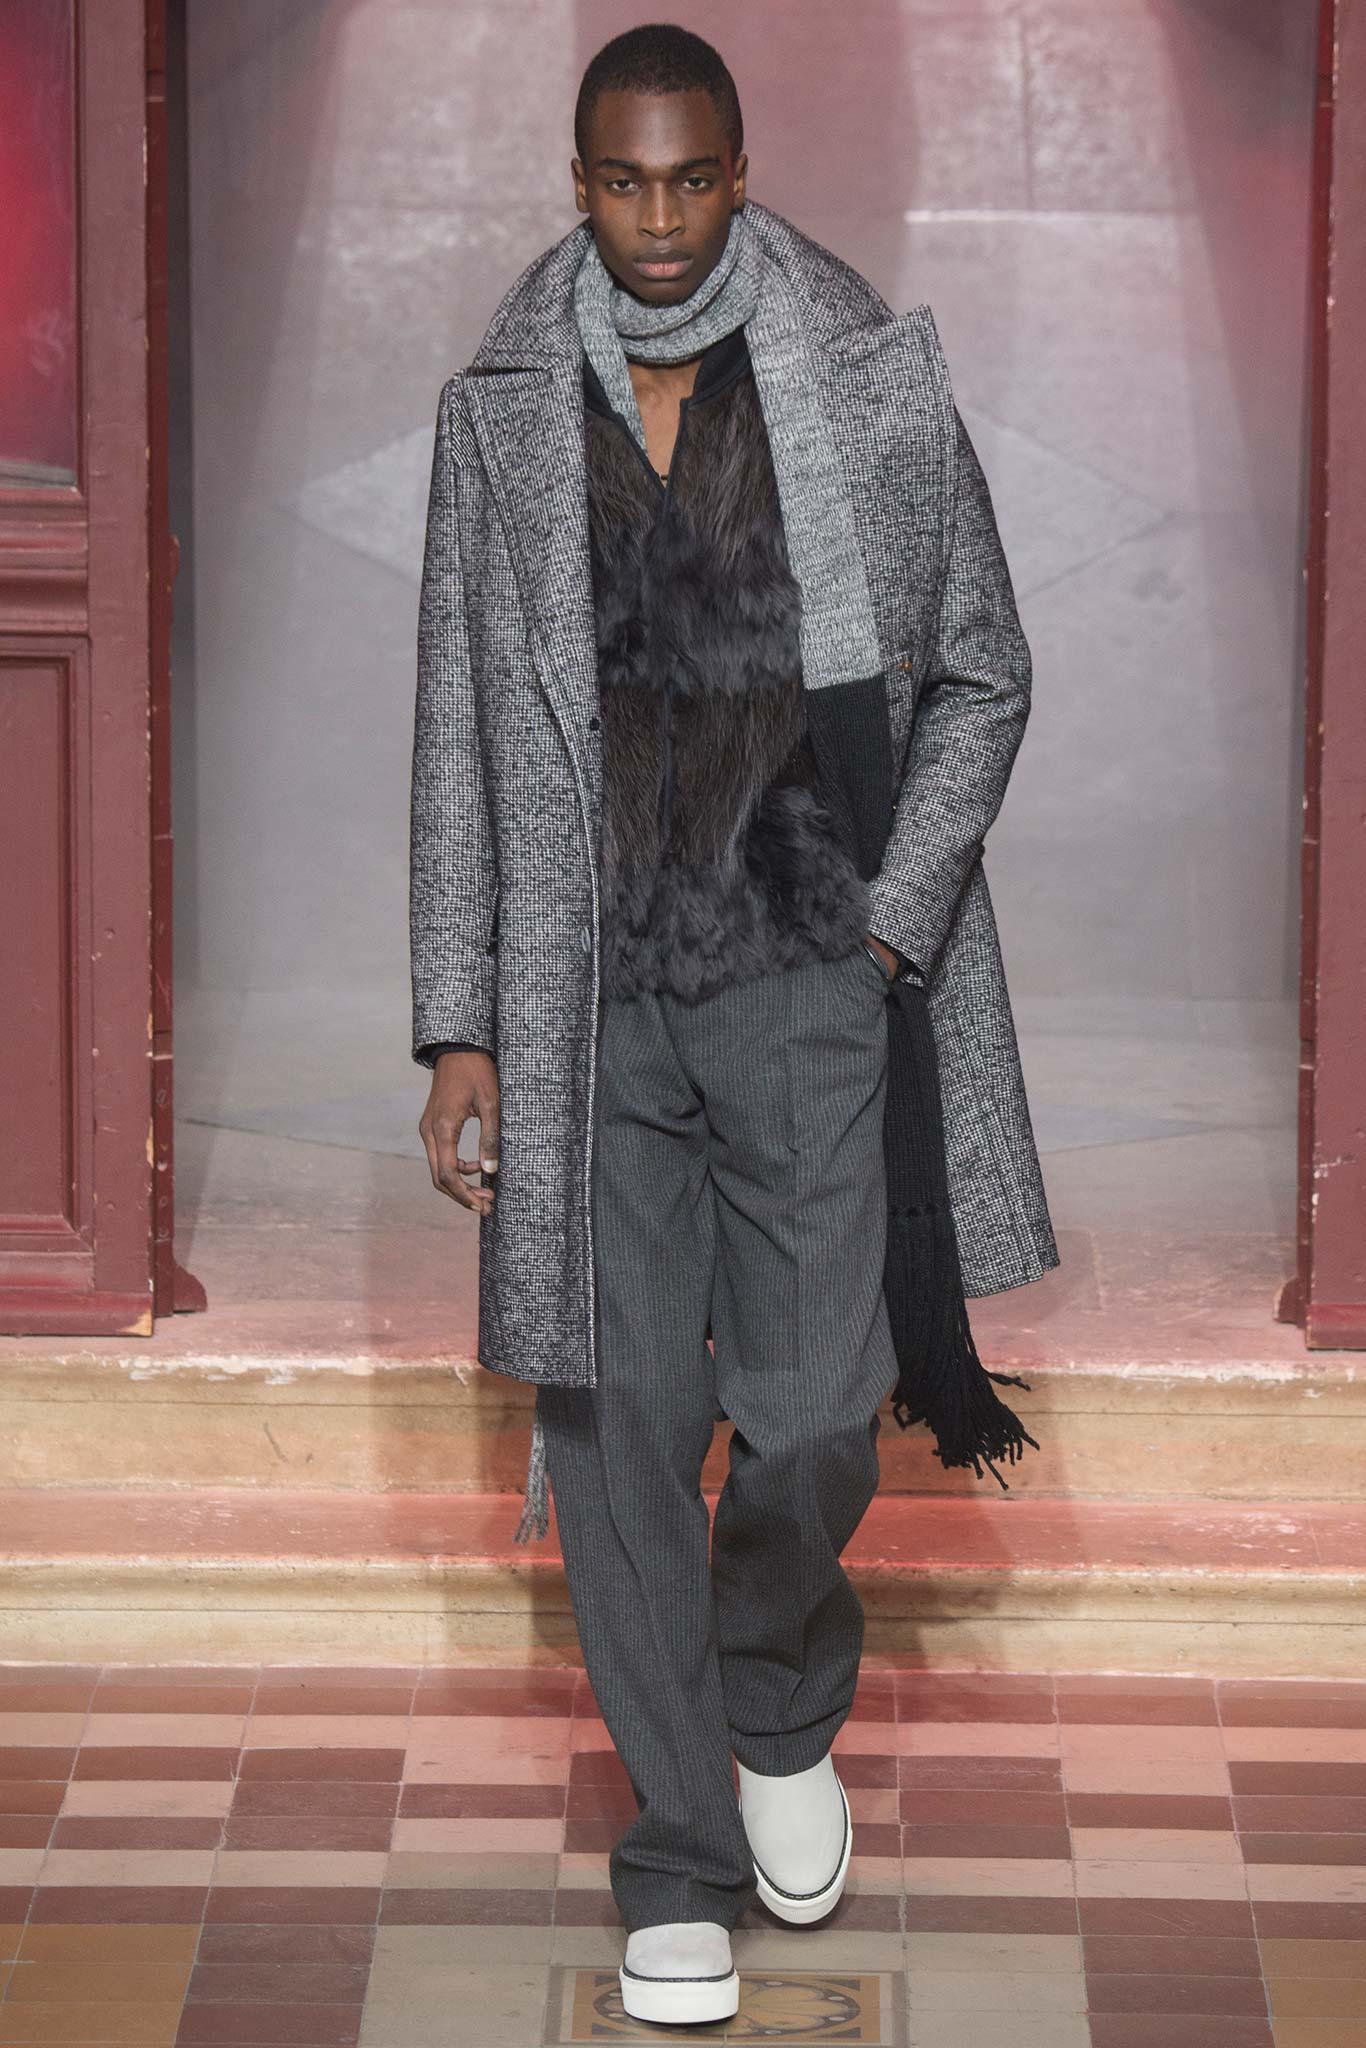 Lanvin Menswear FW 2015 Paris